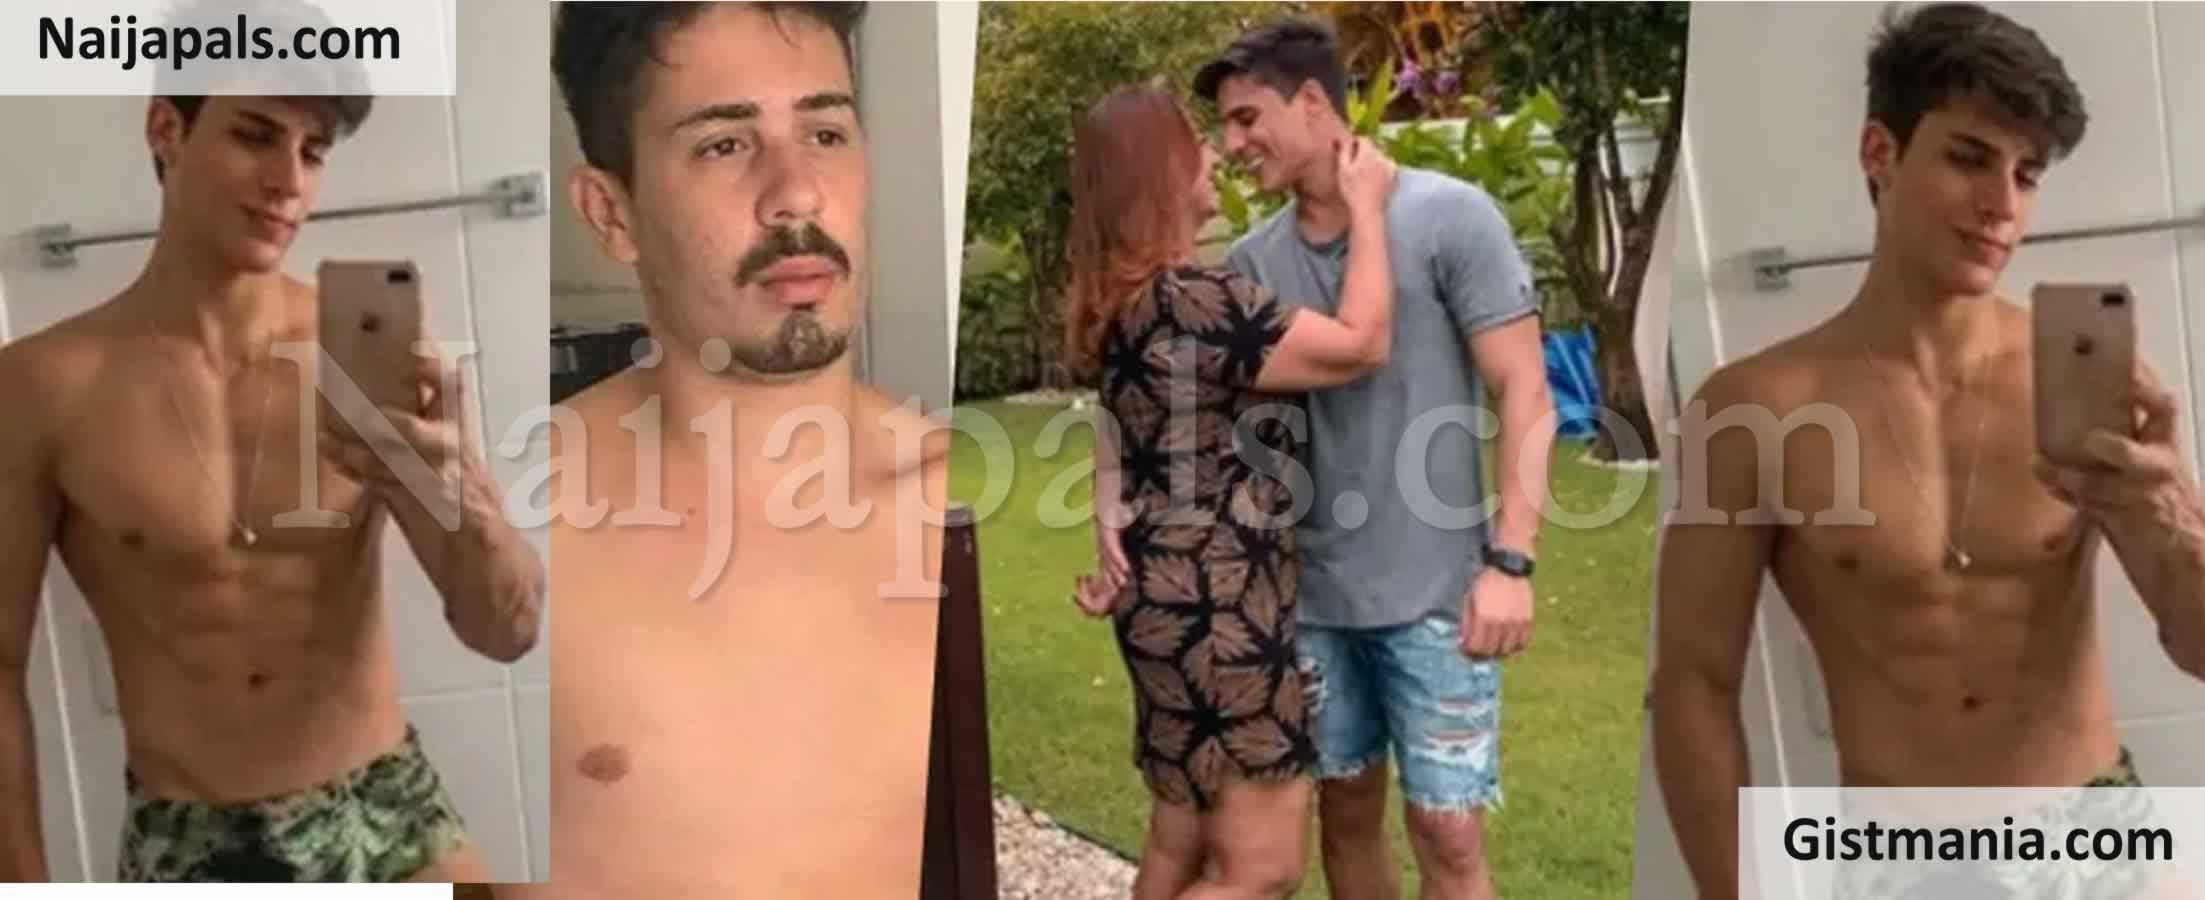 Psg Footballer Neymar Junior S 52 Year Old Mum In Romance